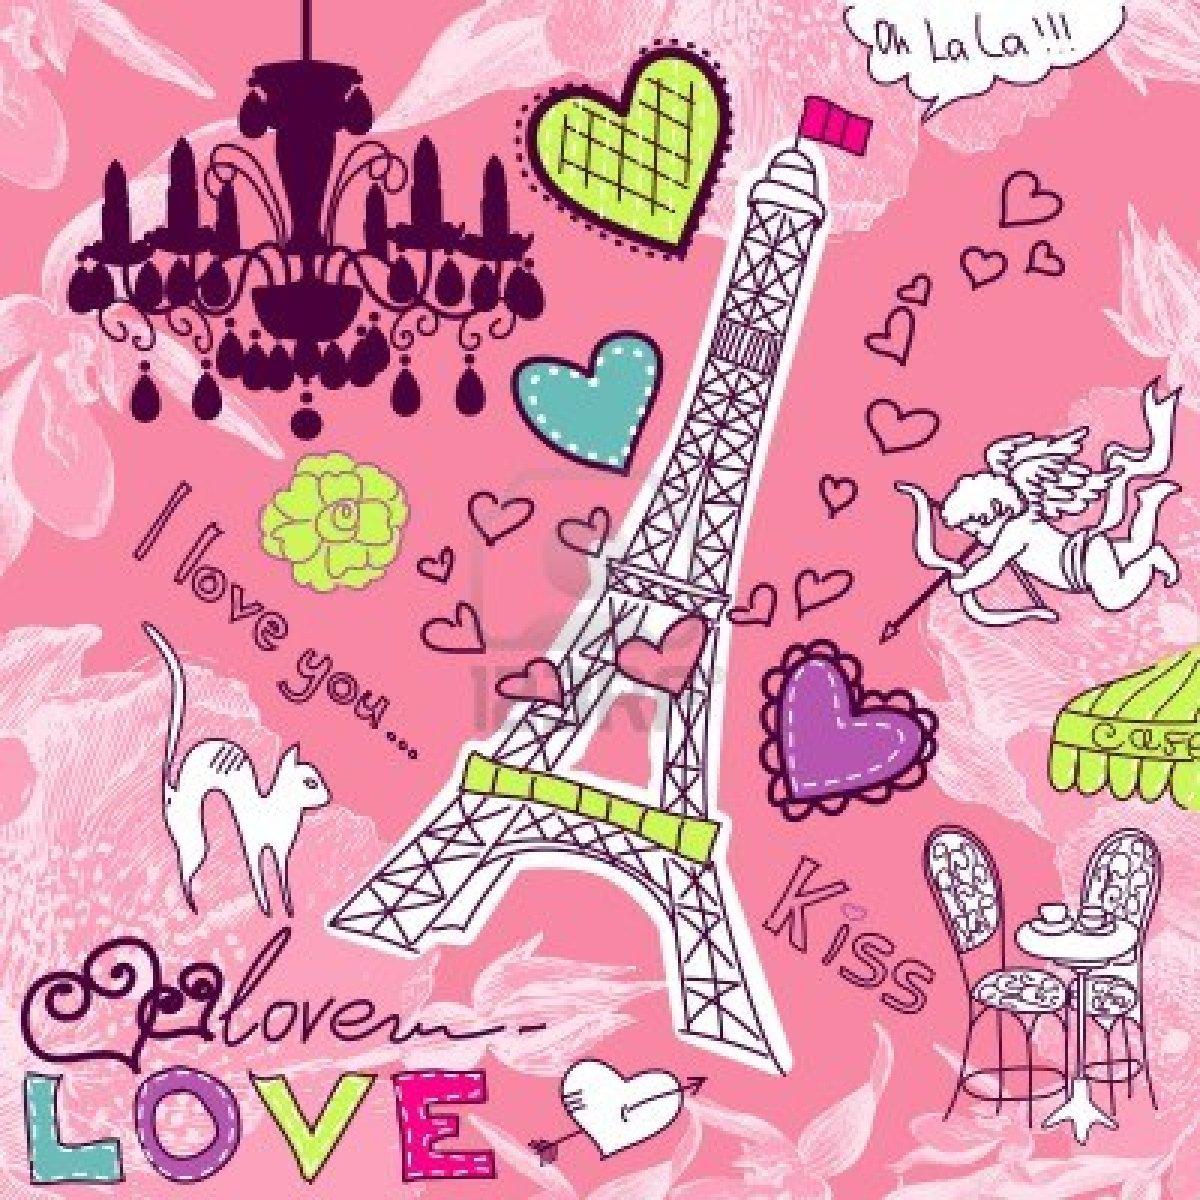 Paris Thanks For You